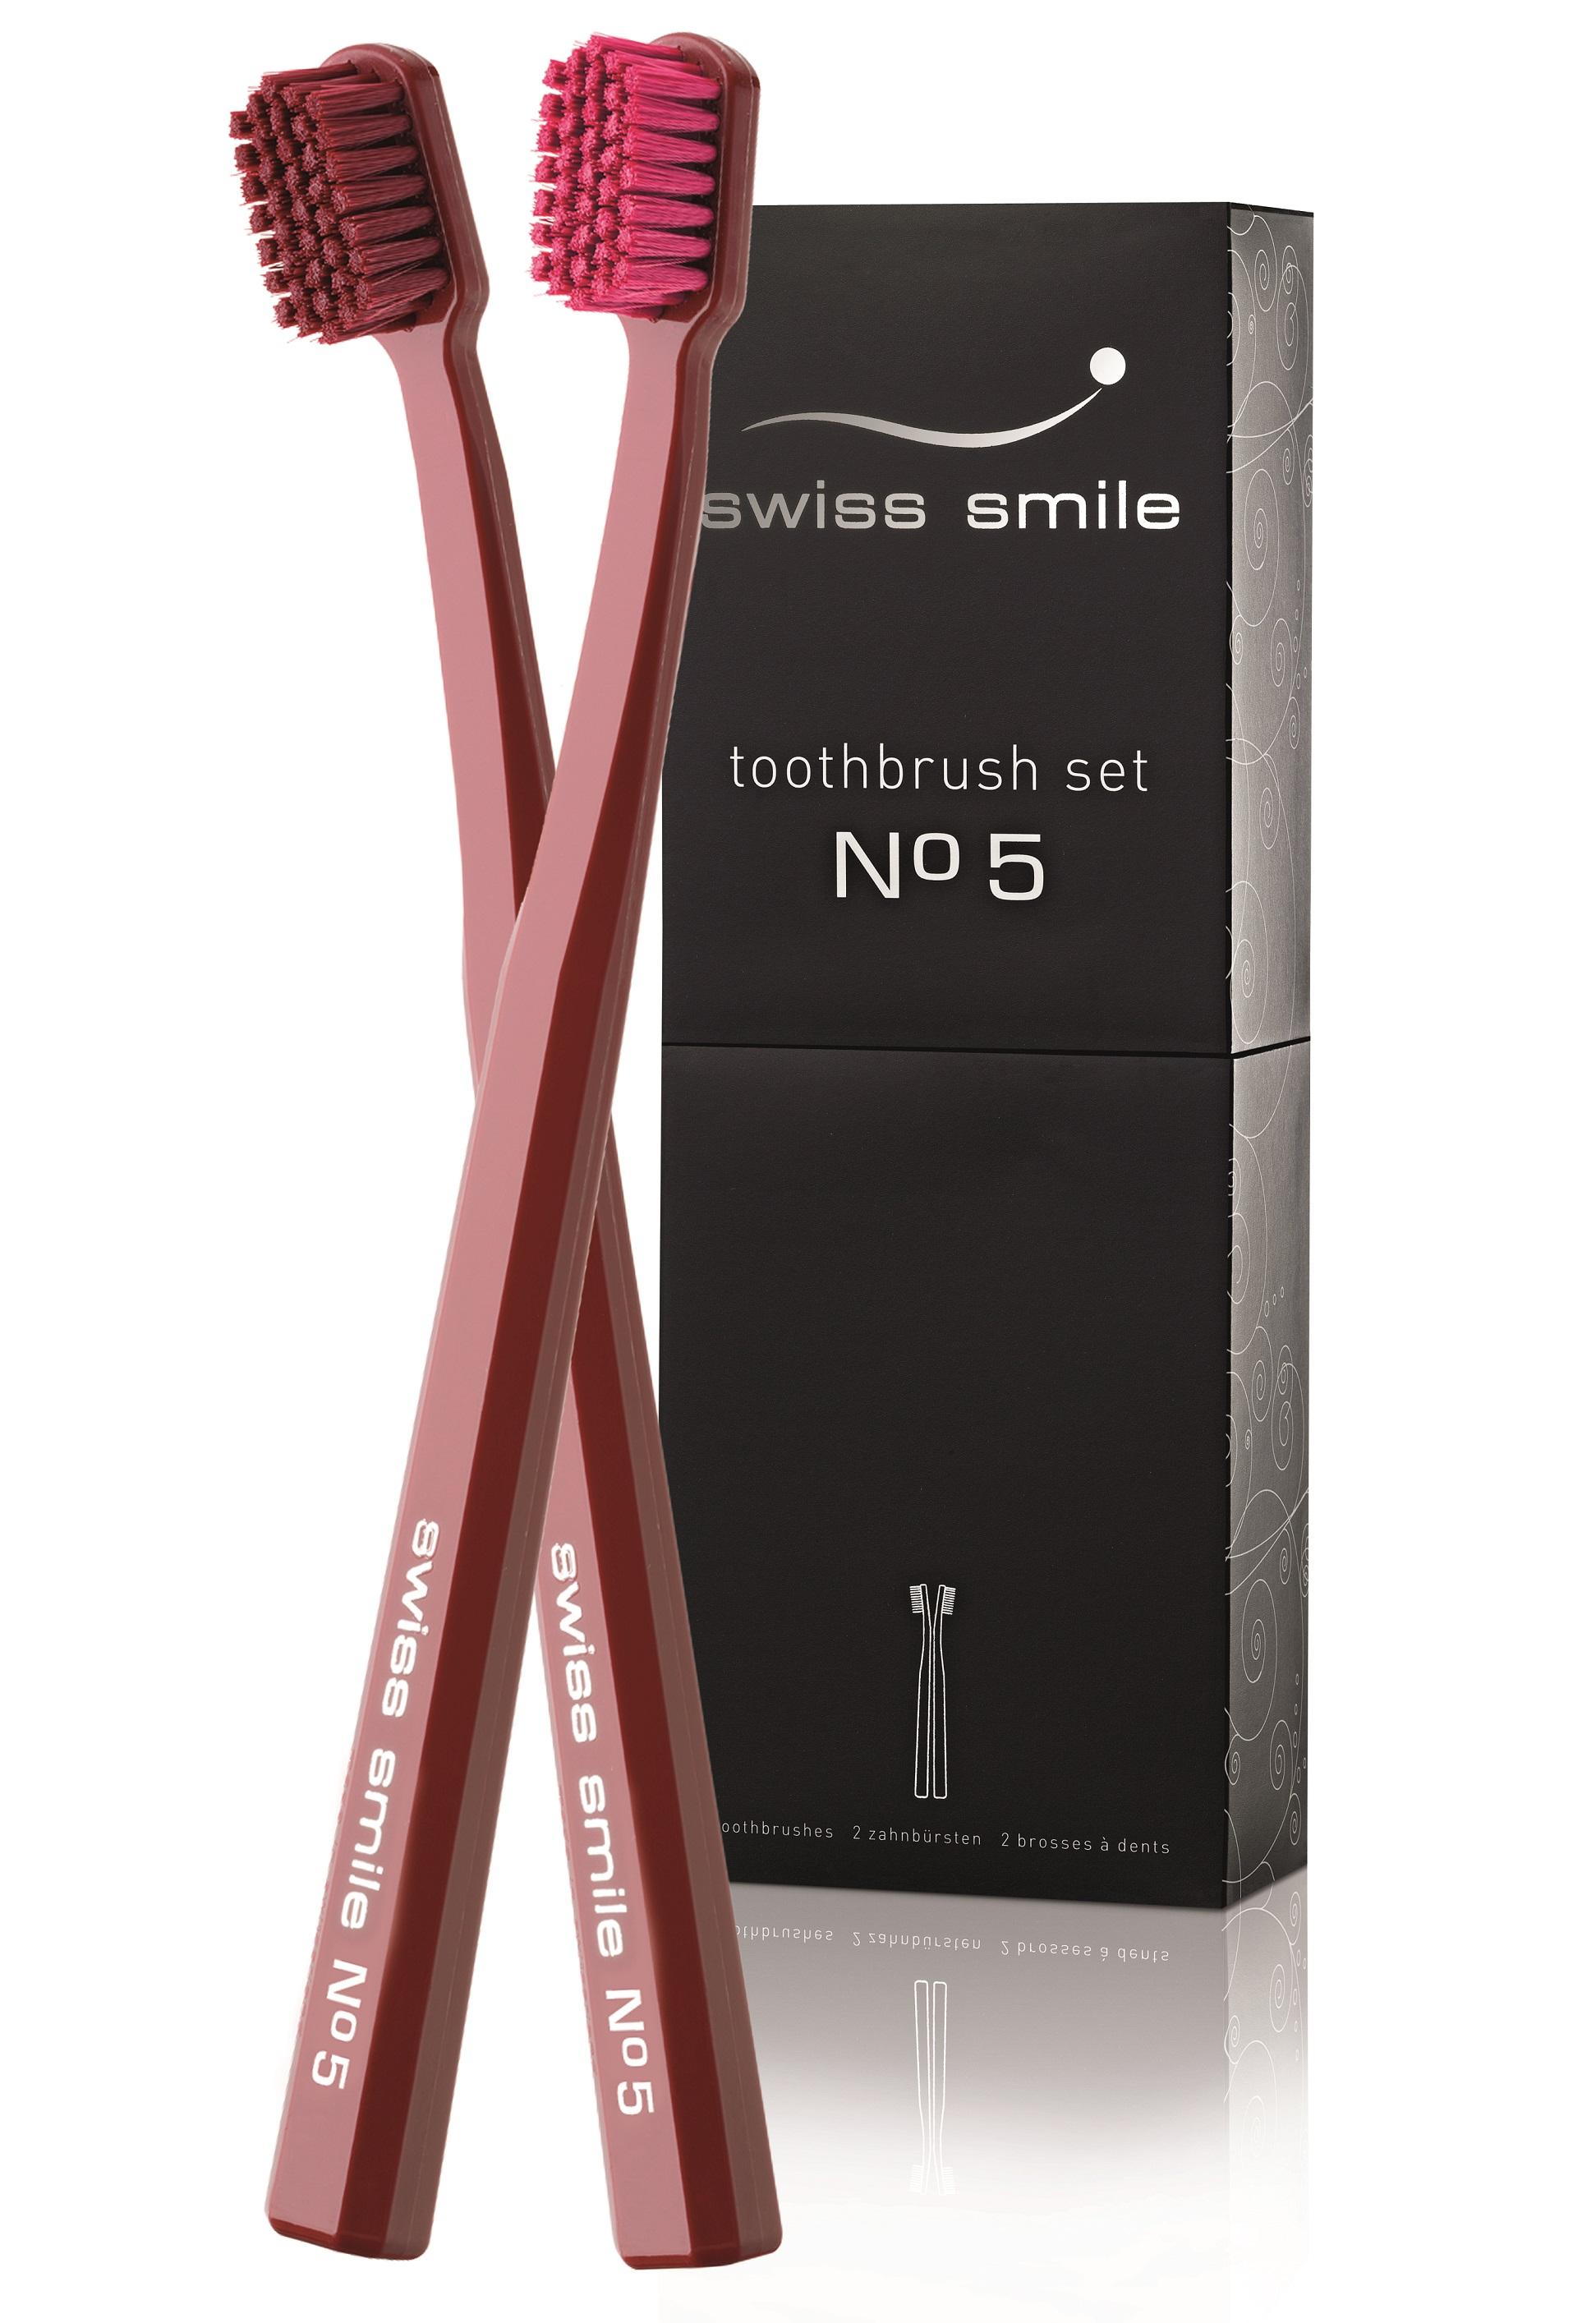 Купить SWISS SMILE Набор мягких зубных щёток №5 2 шт